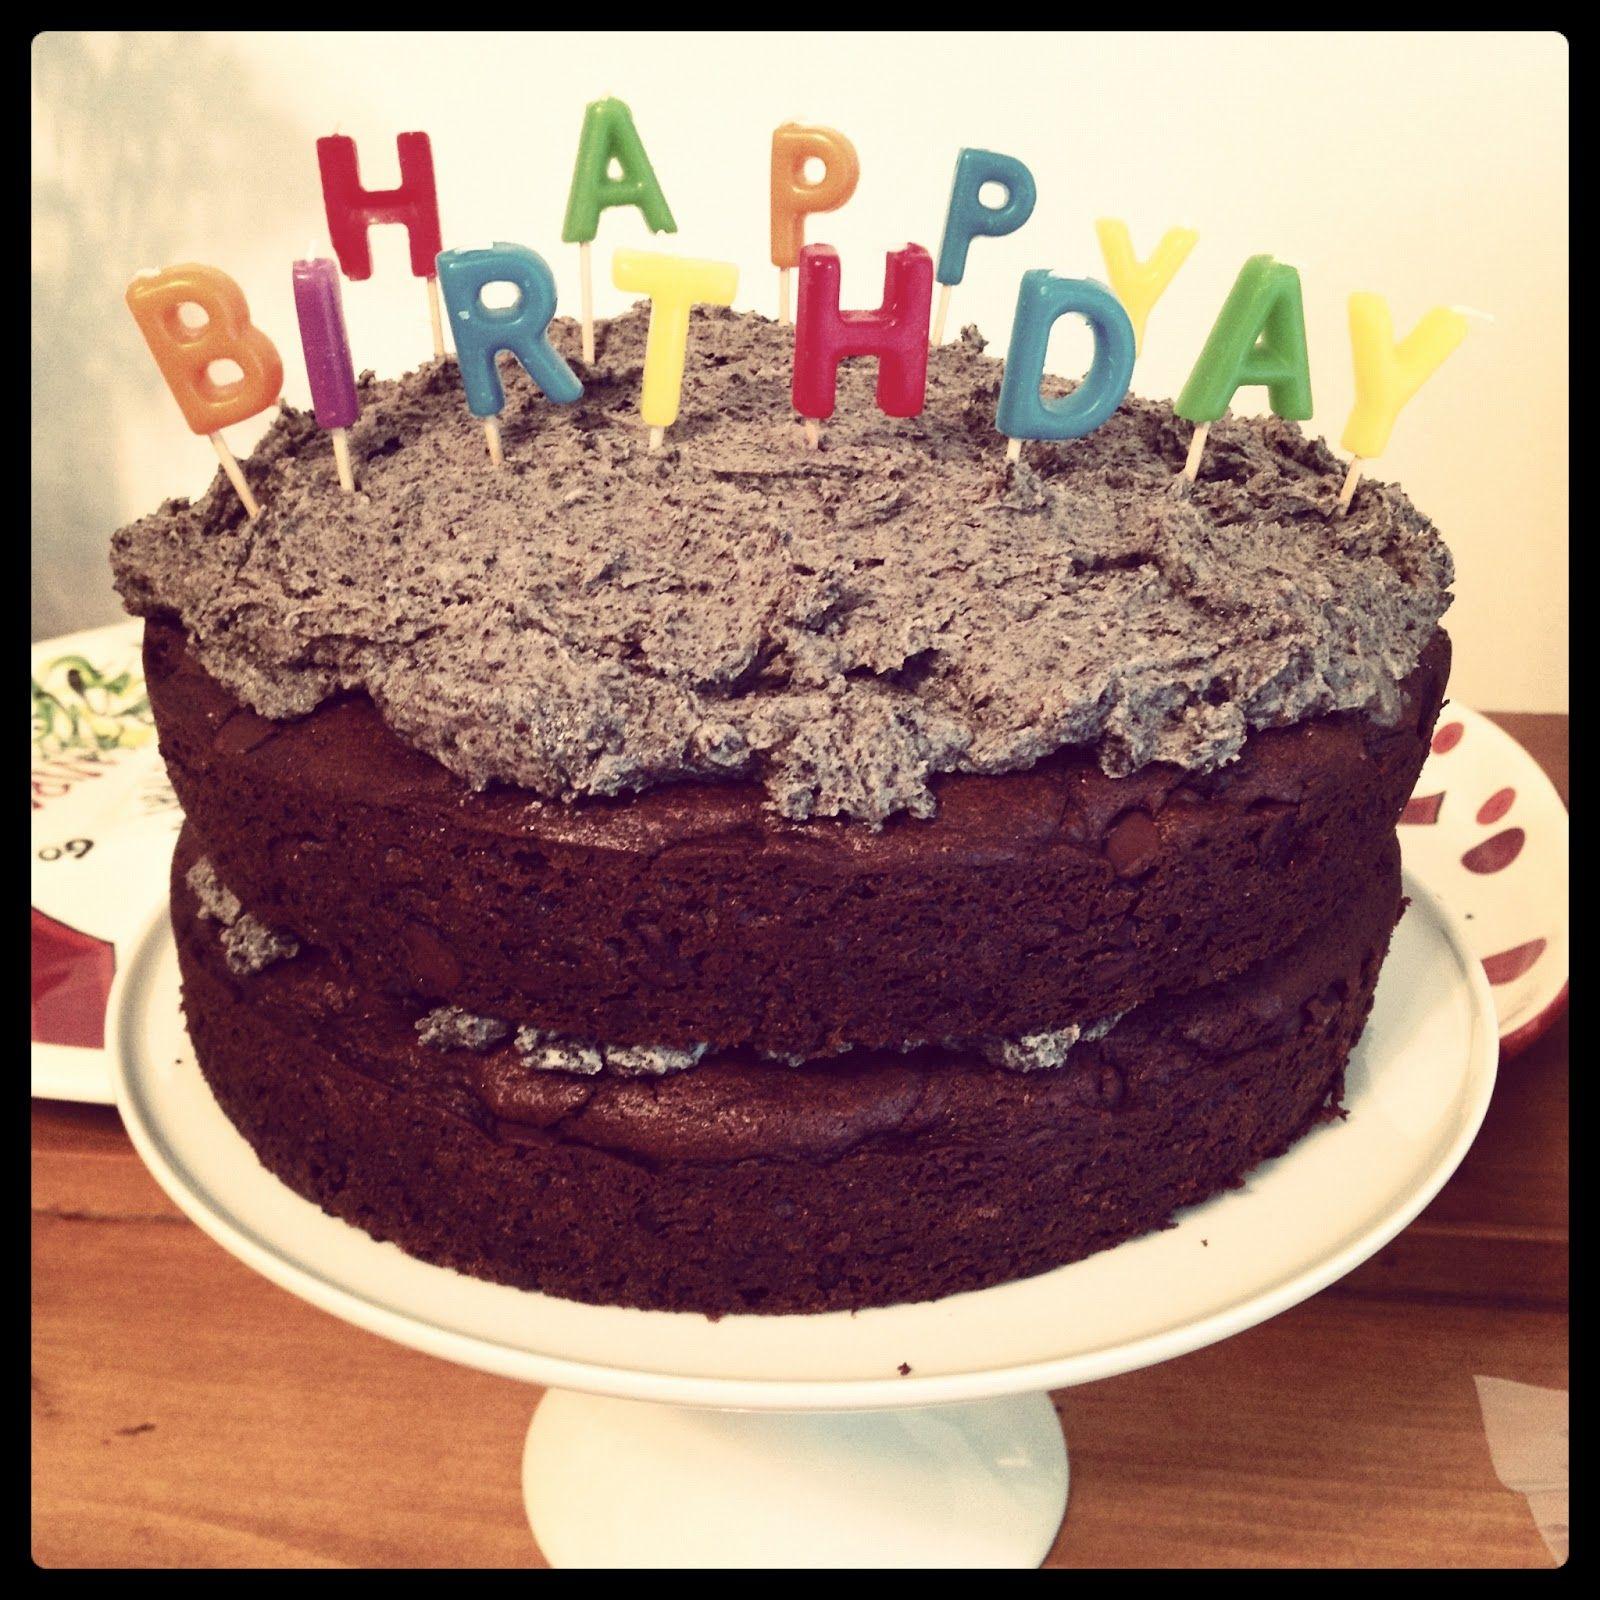 Best Bday Cake Happybirthdaycakespics Pinterest